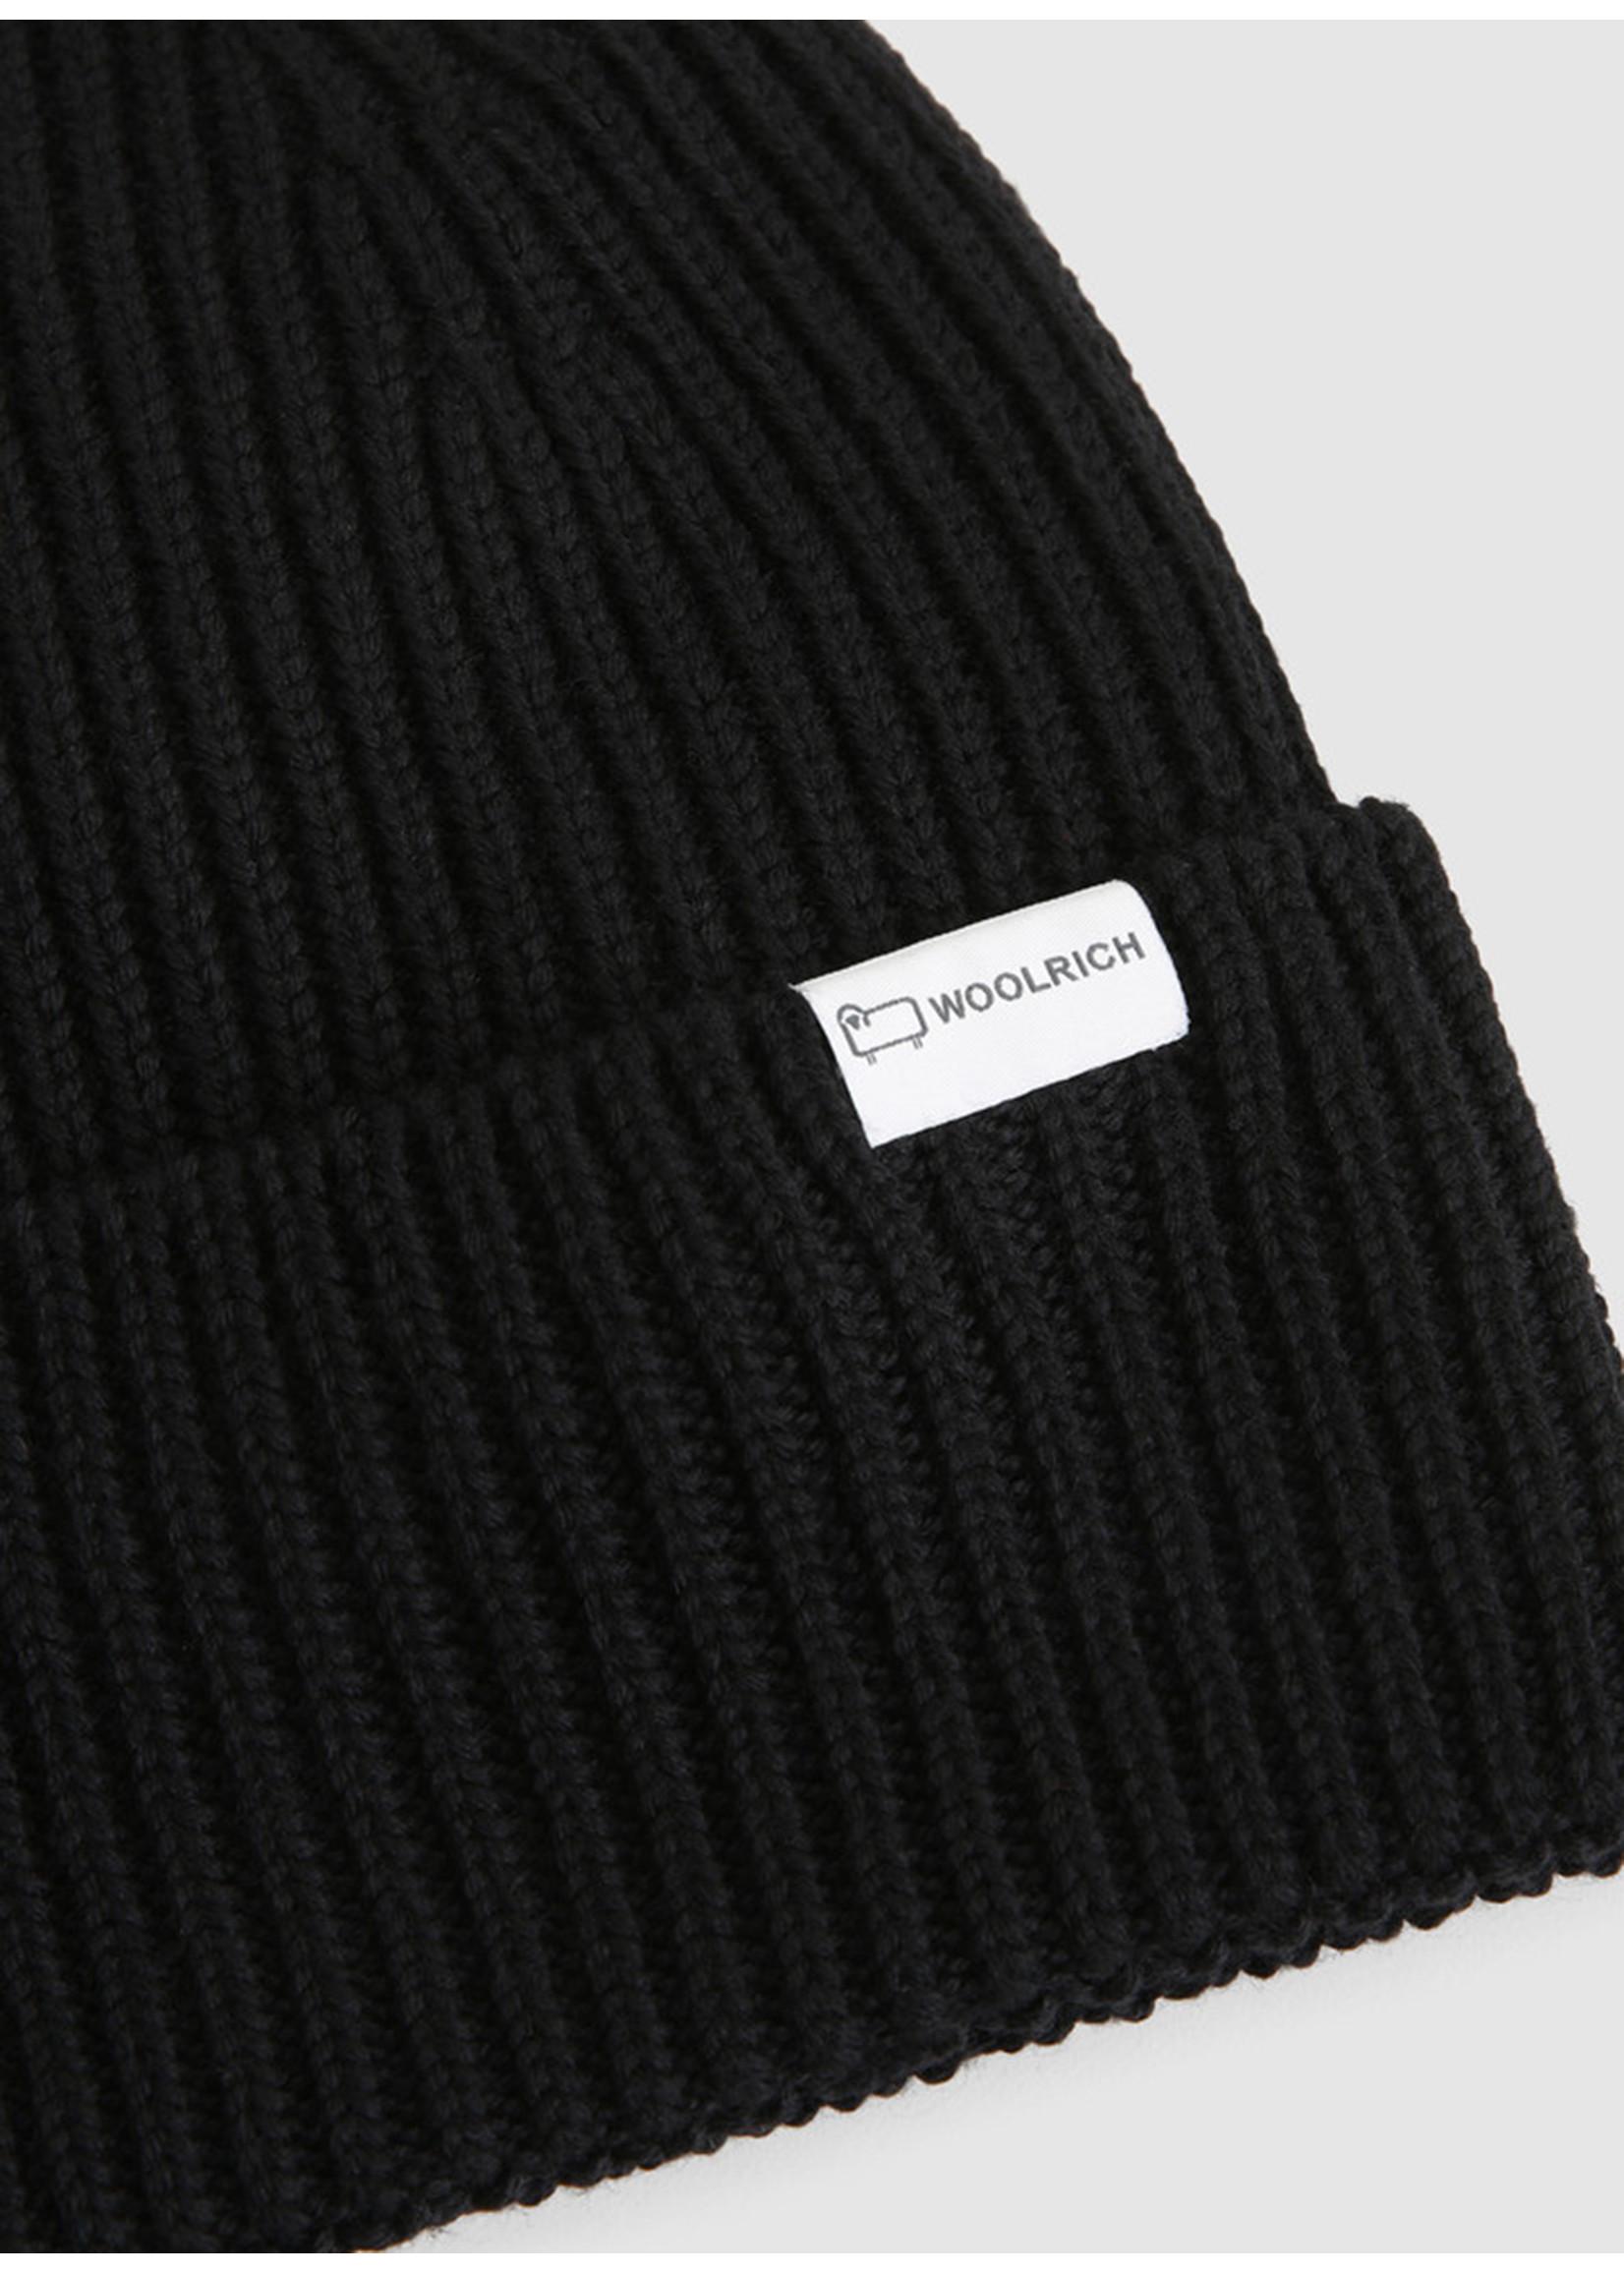 Woolrich Double Rib Beanie Hat Black